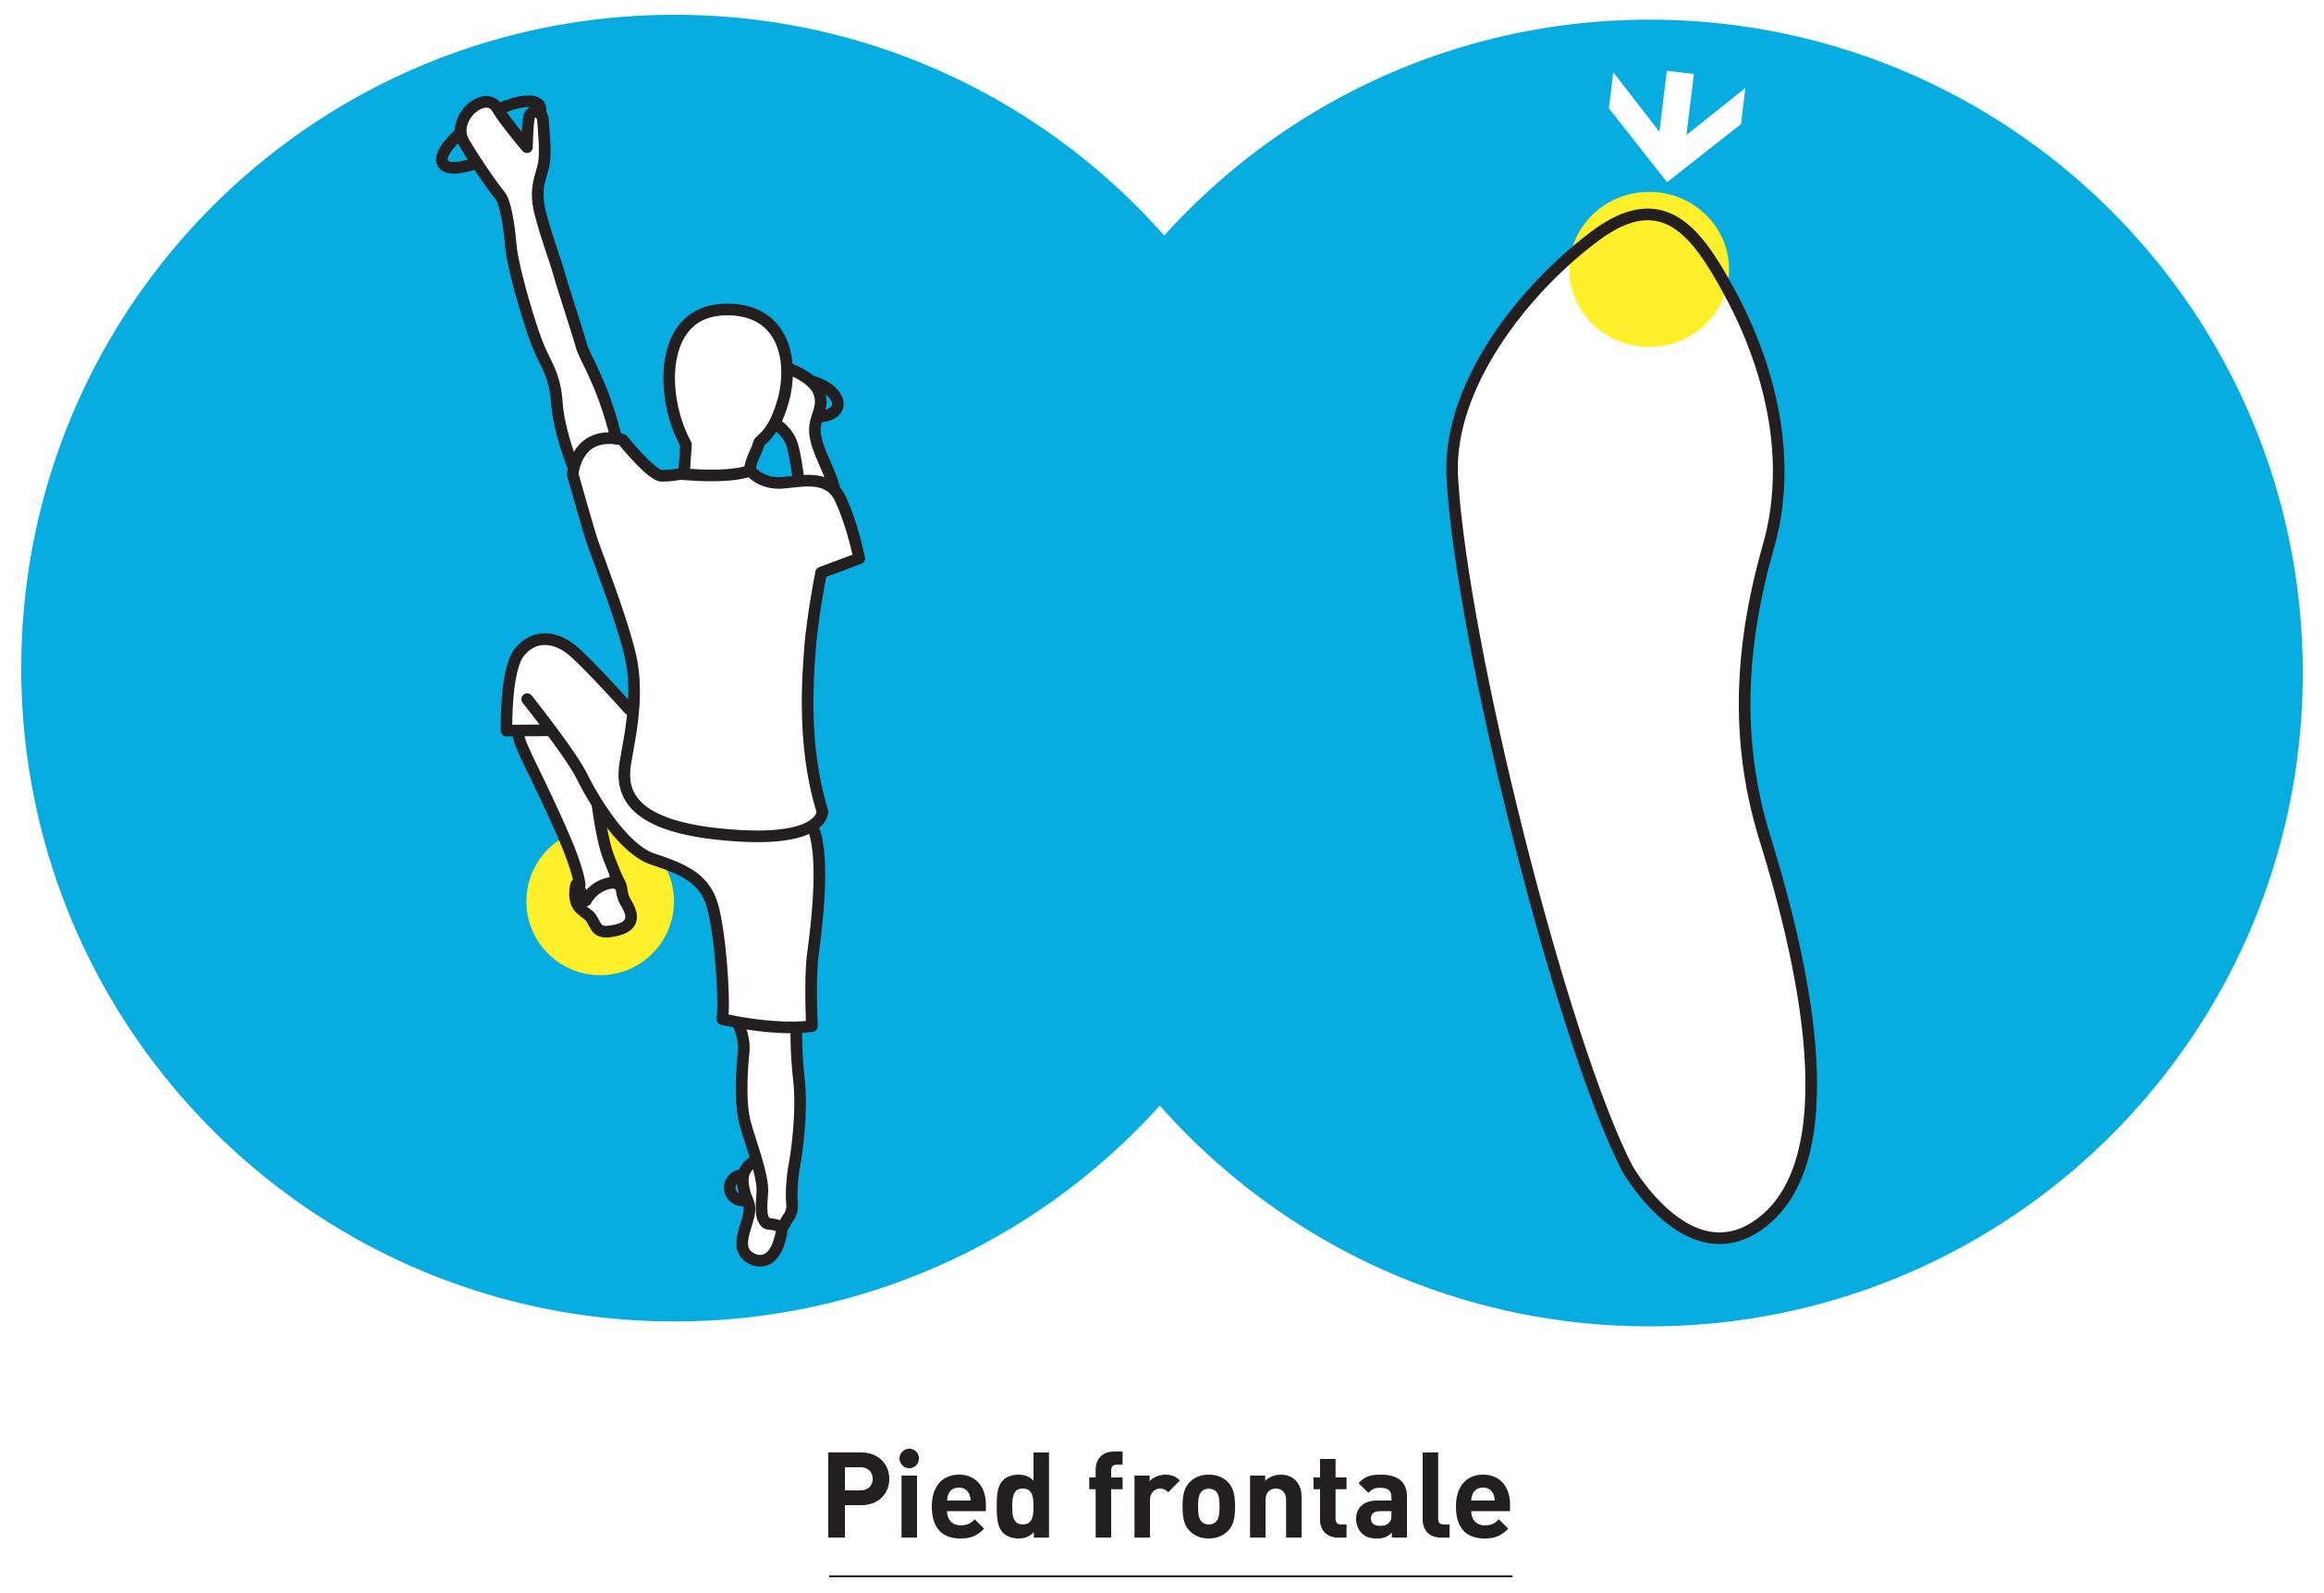 Pied_frontale.jpg